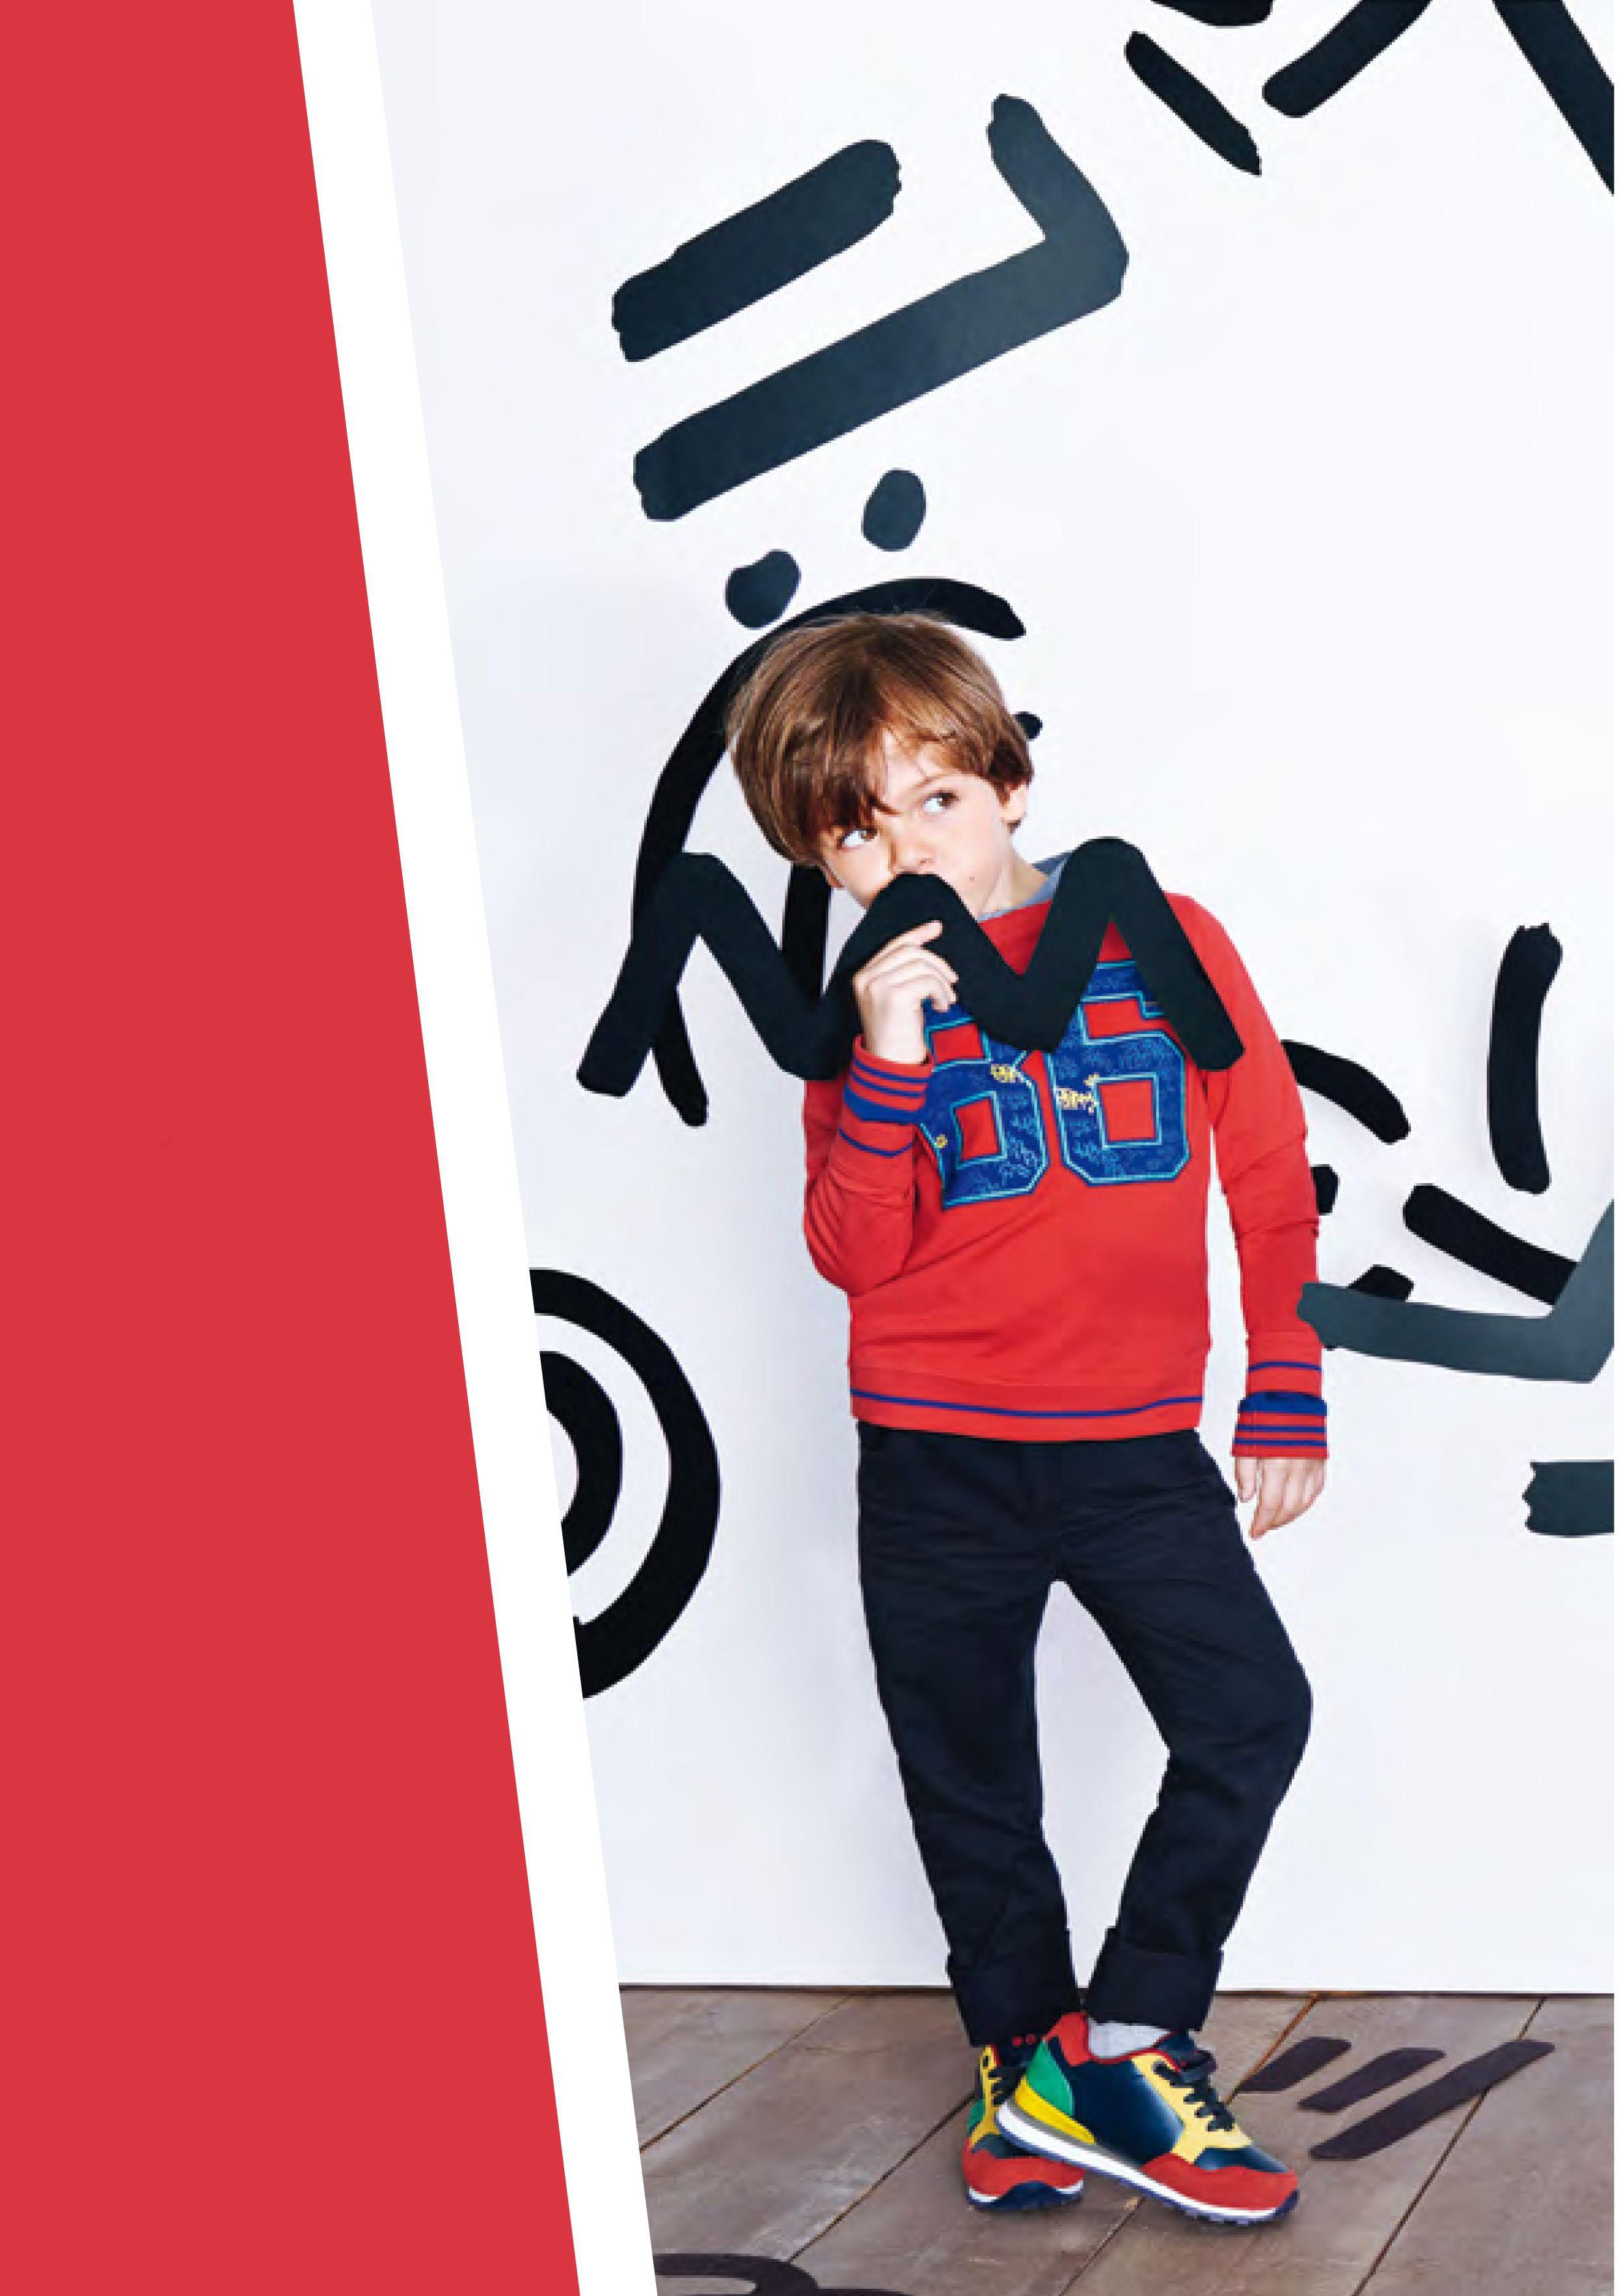 c3d487b852cb6  dpam  lookbook  collection  enfant  garcon  mode  kid  boy  fashion  outfit